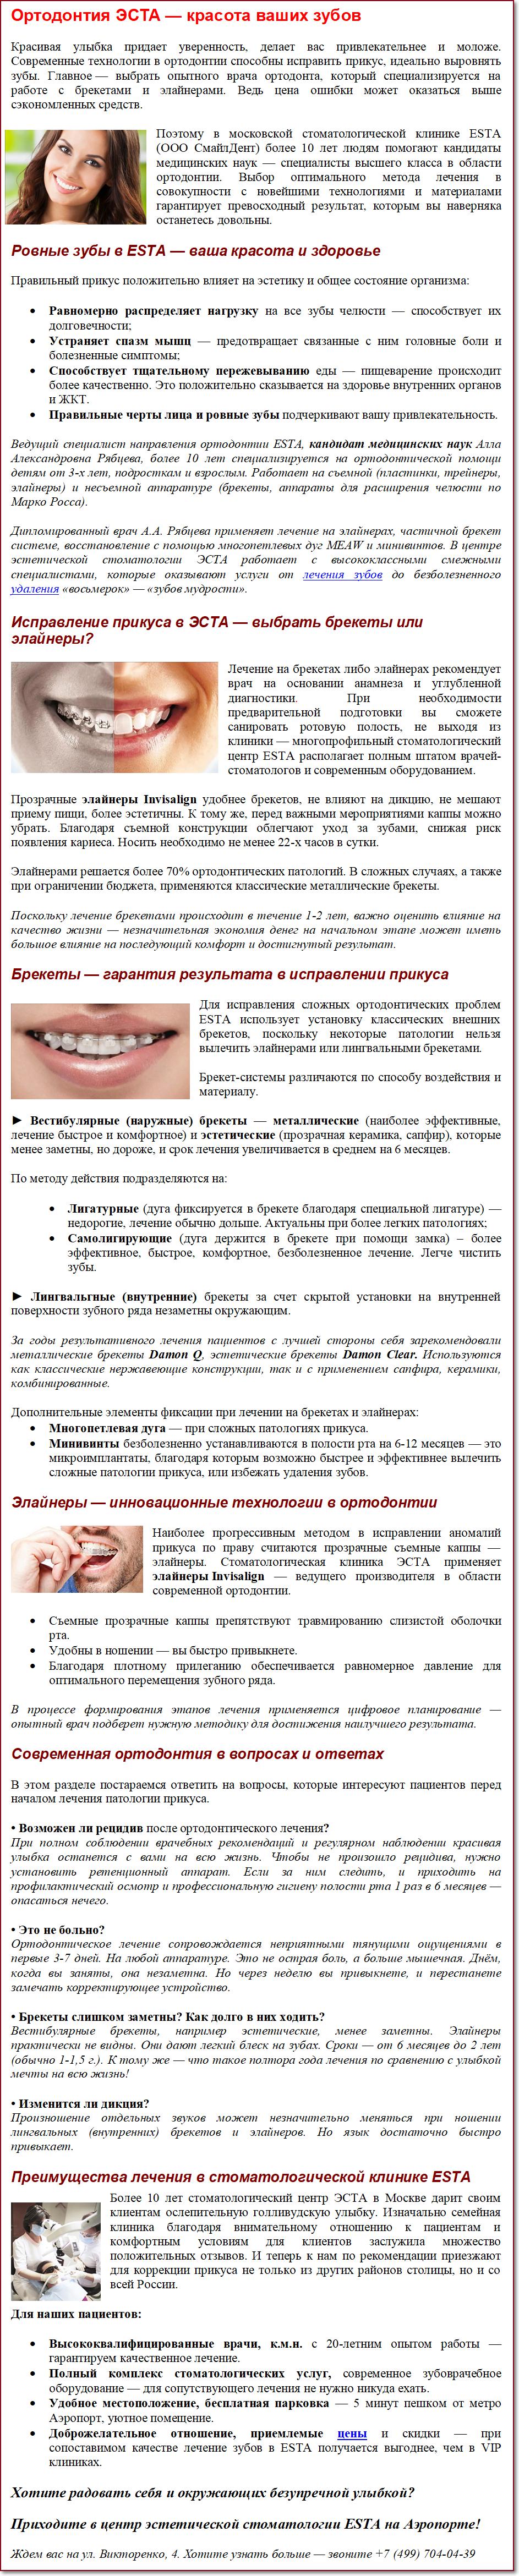 Описание услуг по ортодонтии